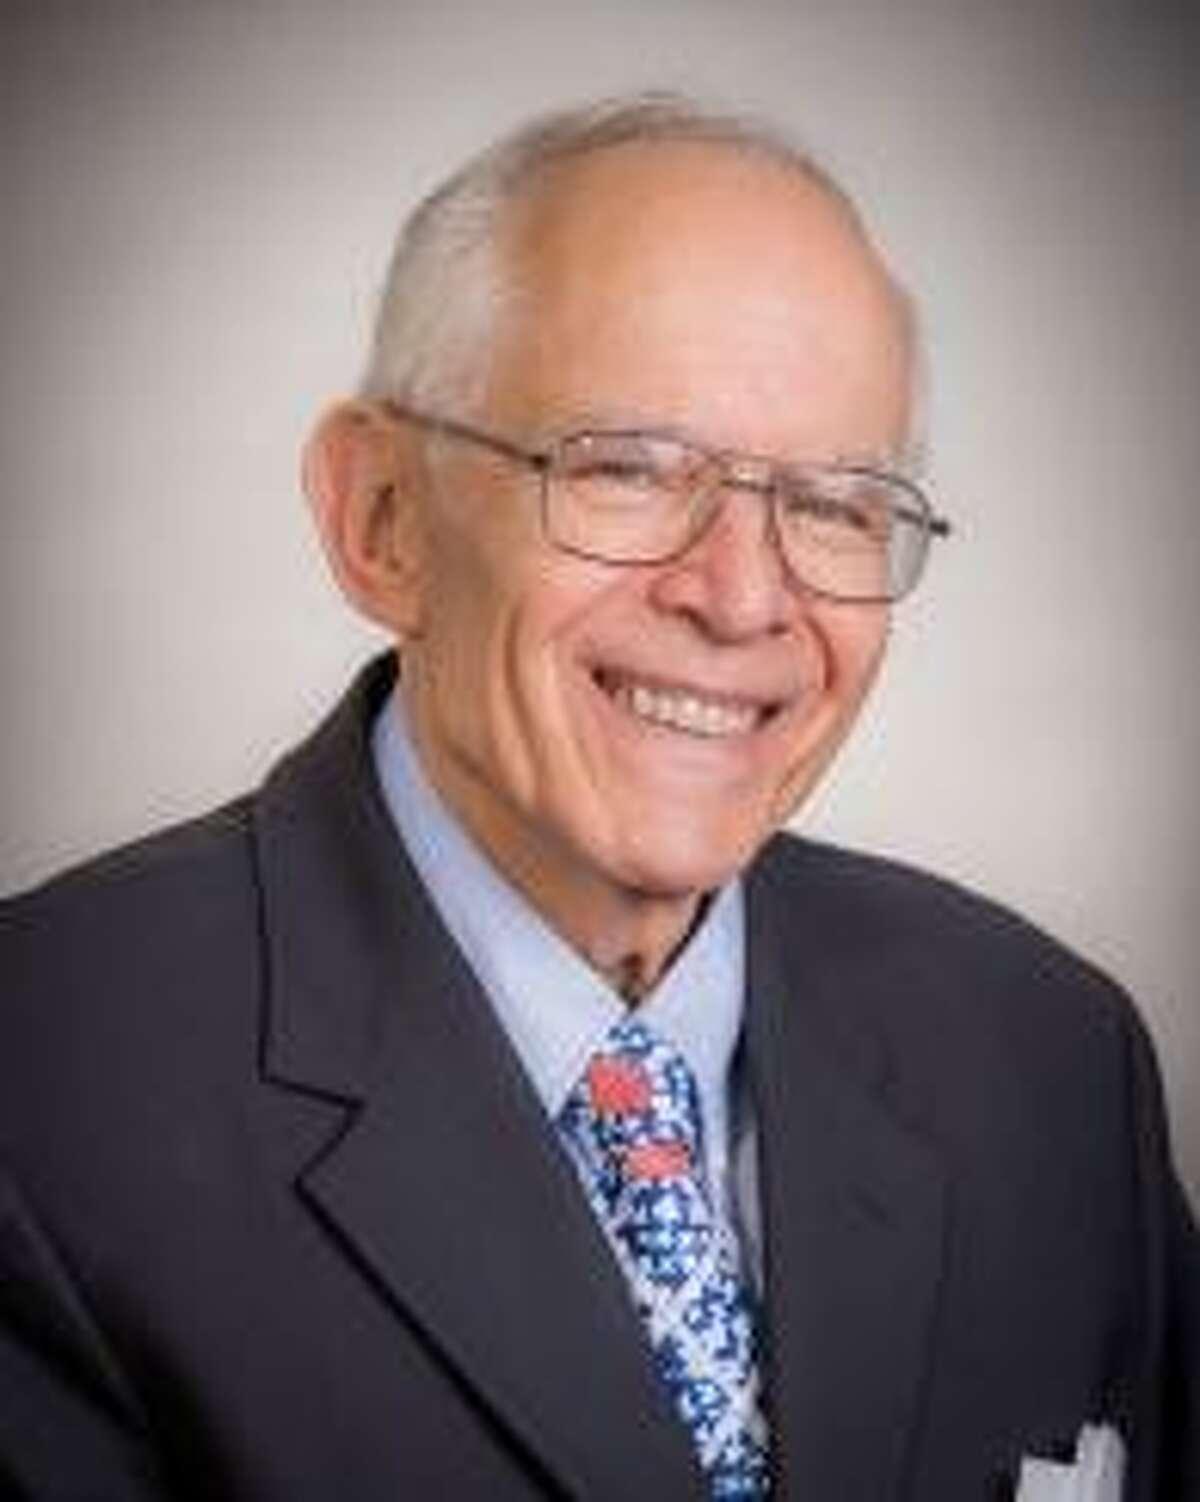 James Dannenbaum